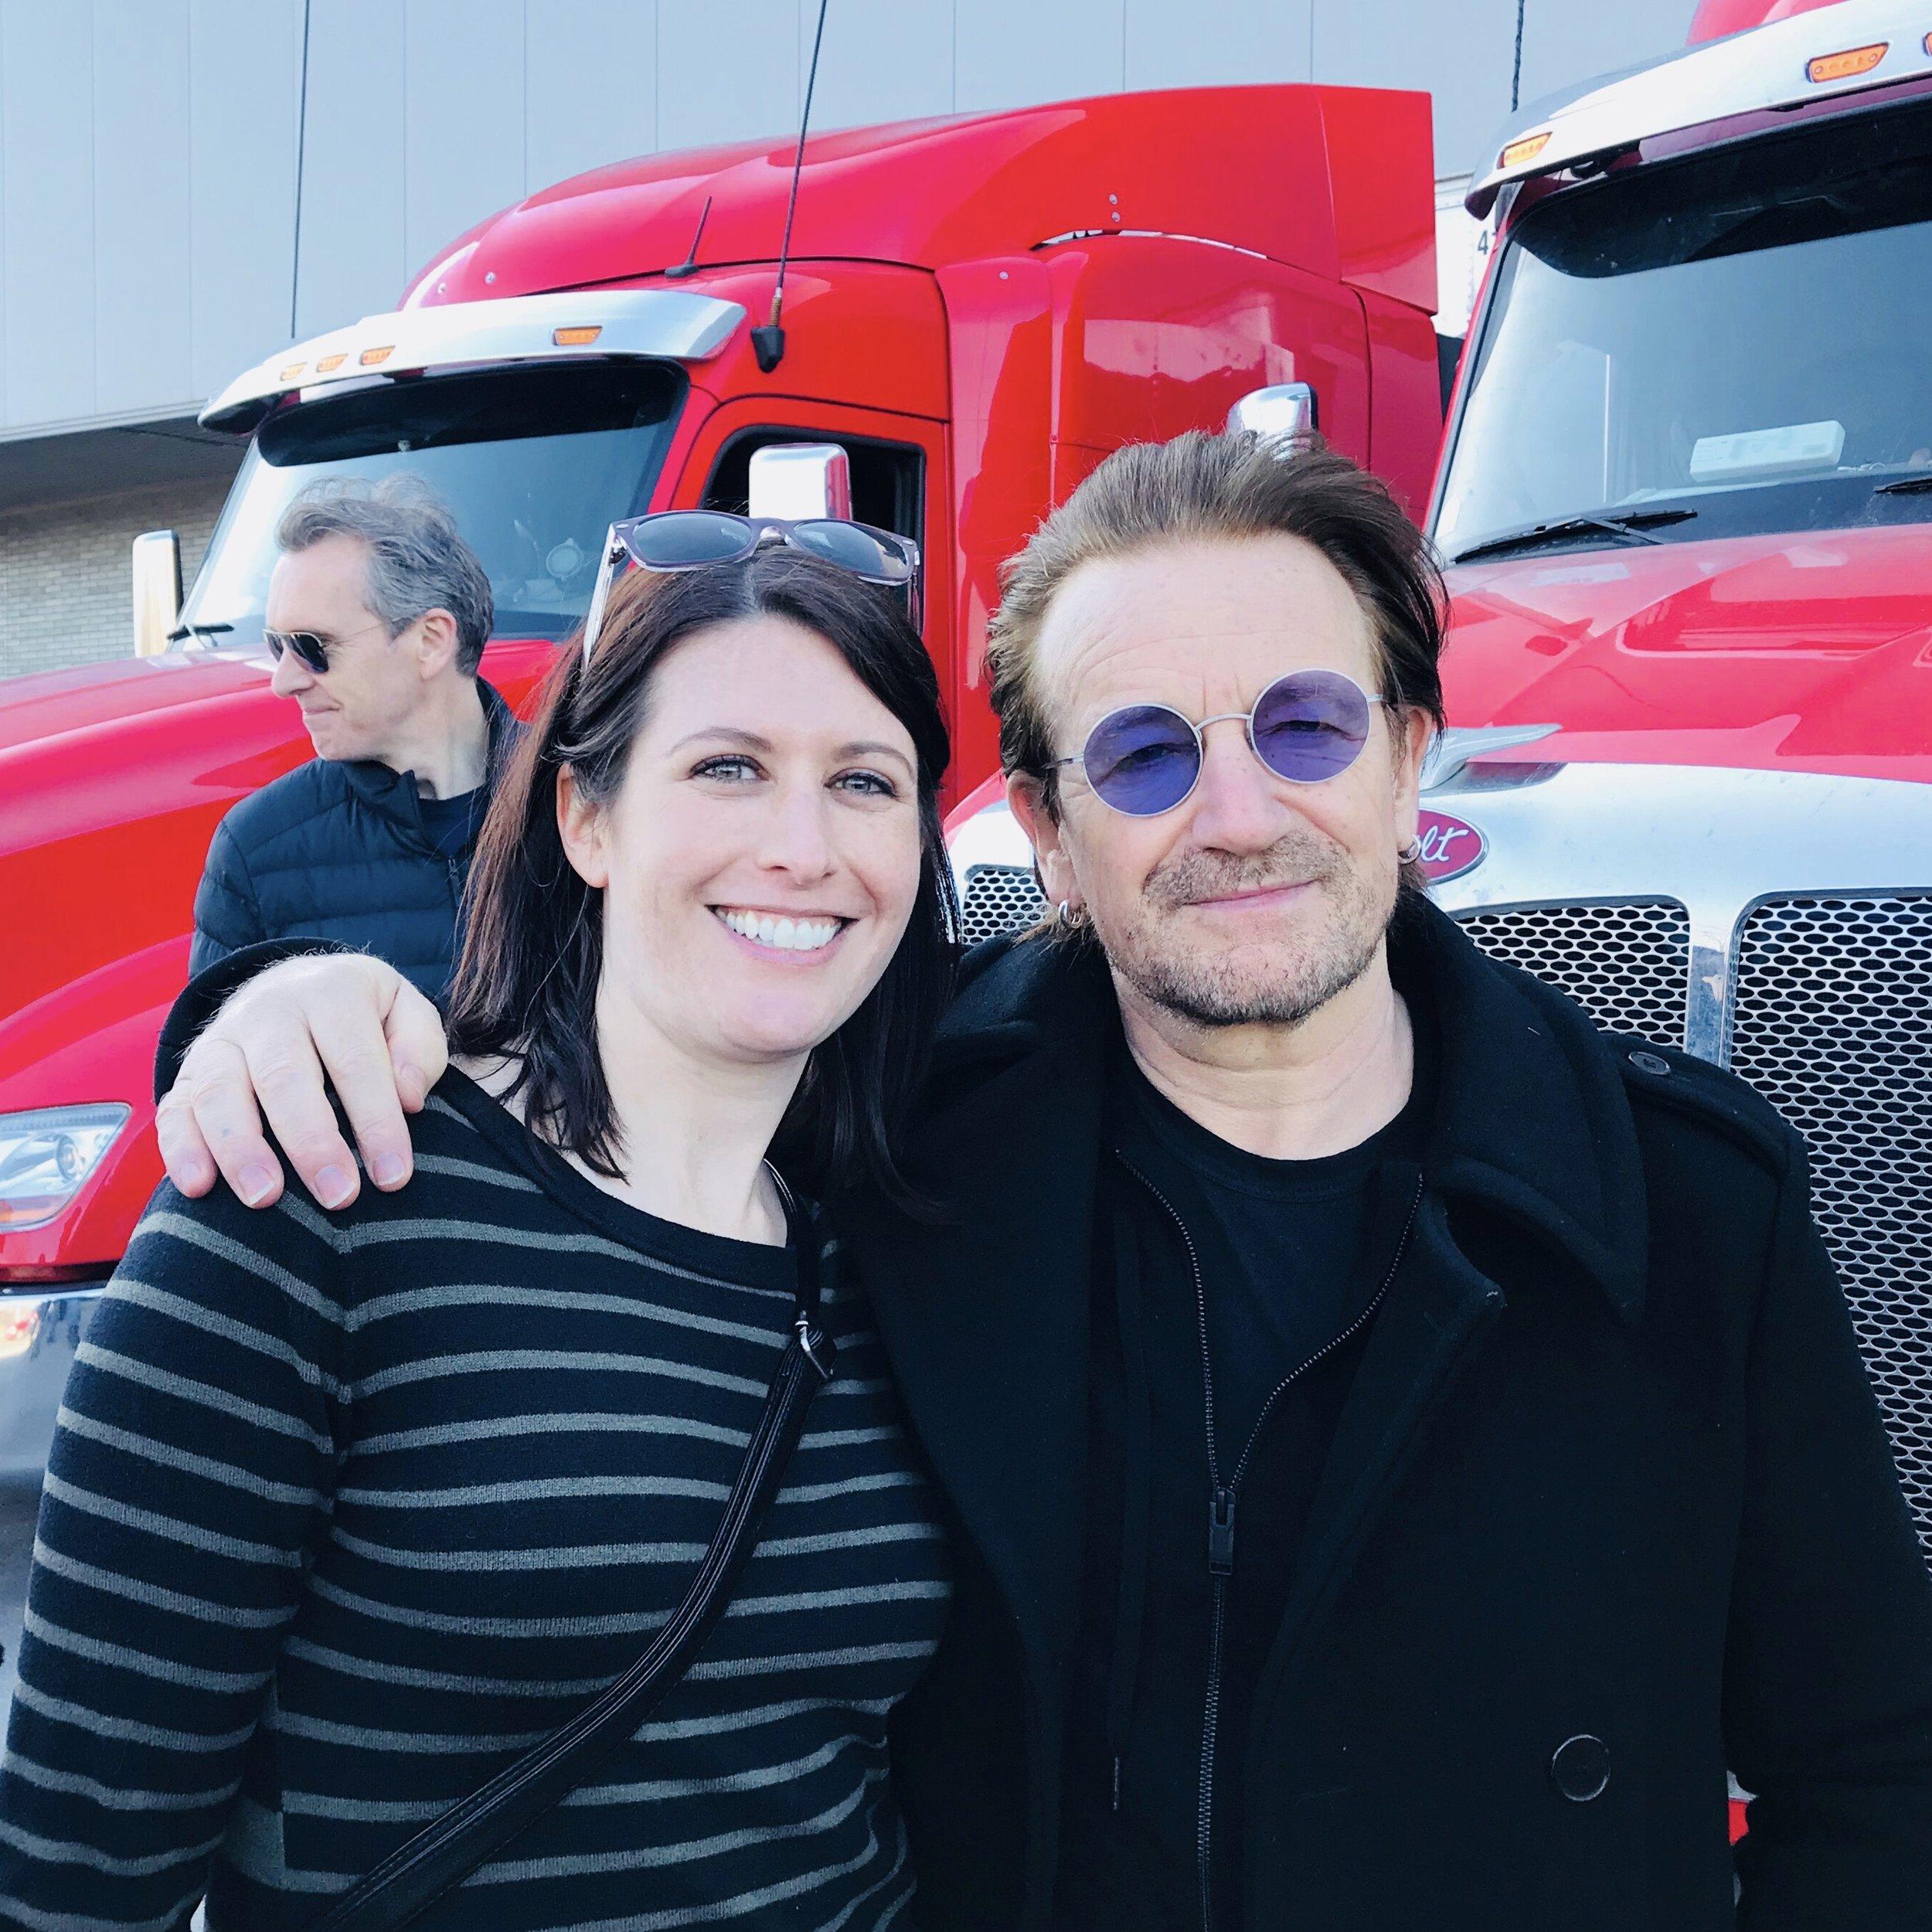 April 21, 2018 - with Bono Photo Credit: Brian Murphy